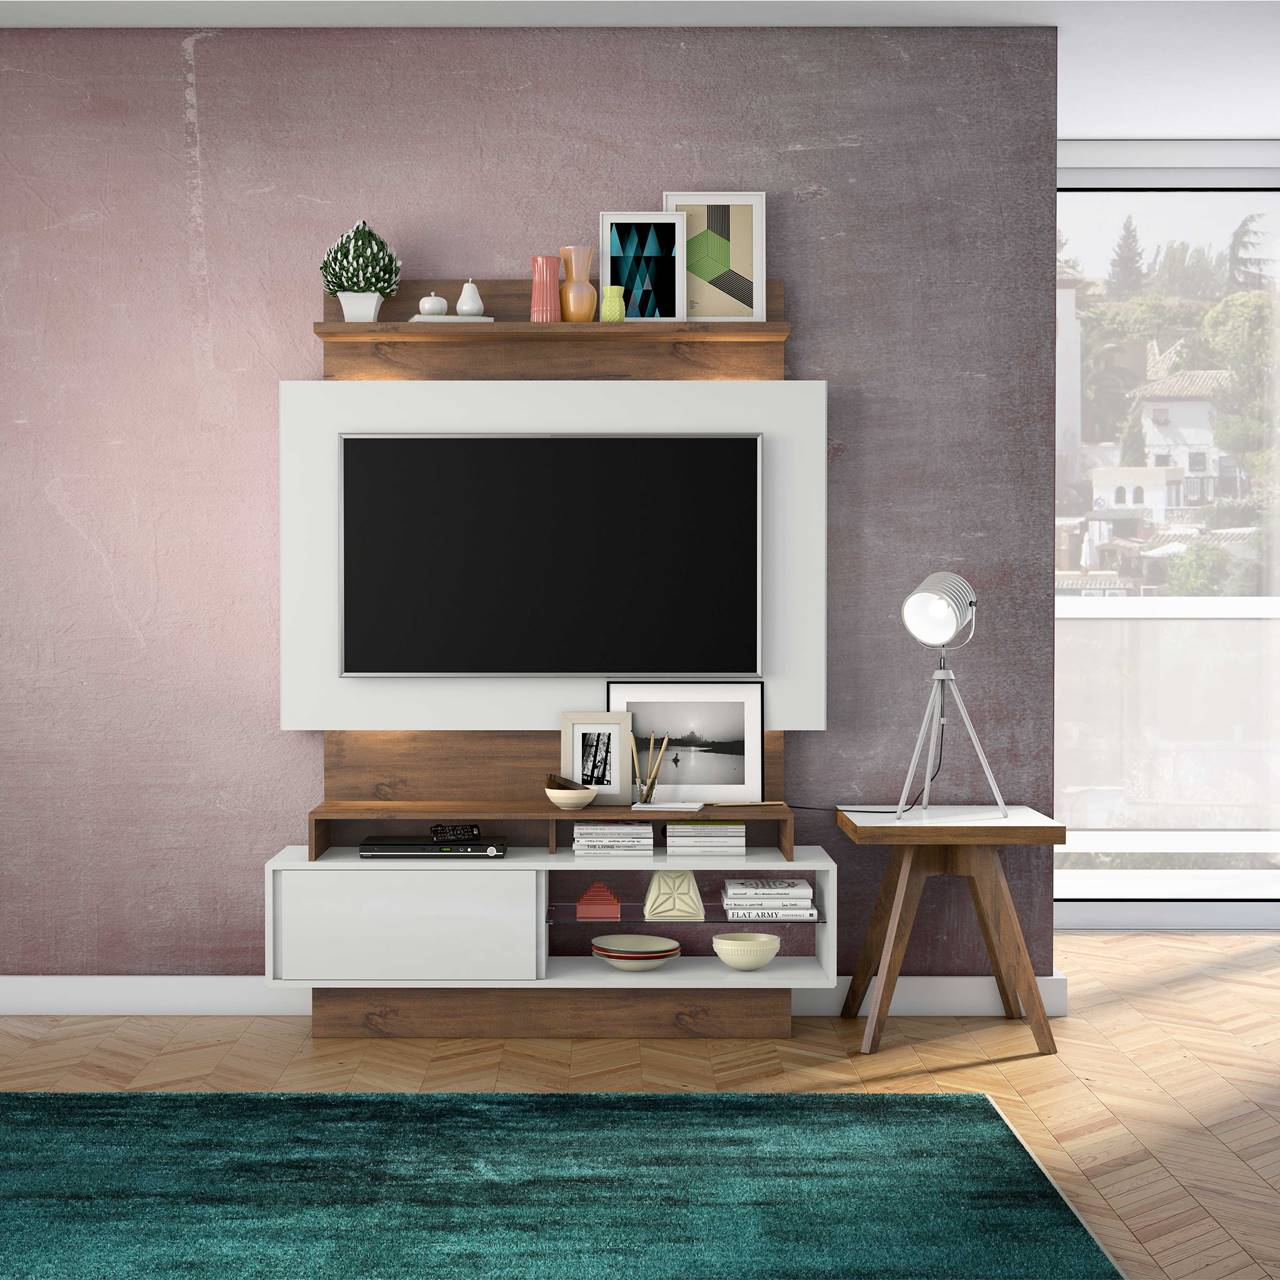 "Painel Home Suspenso p/ TV até 55"" com LED TB111L Dalla Costa Offwhite/Nobre"